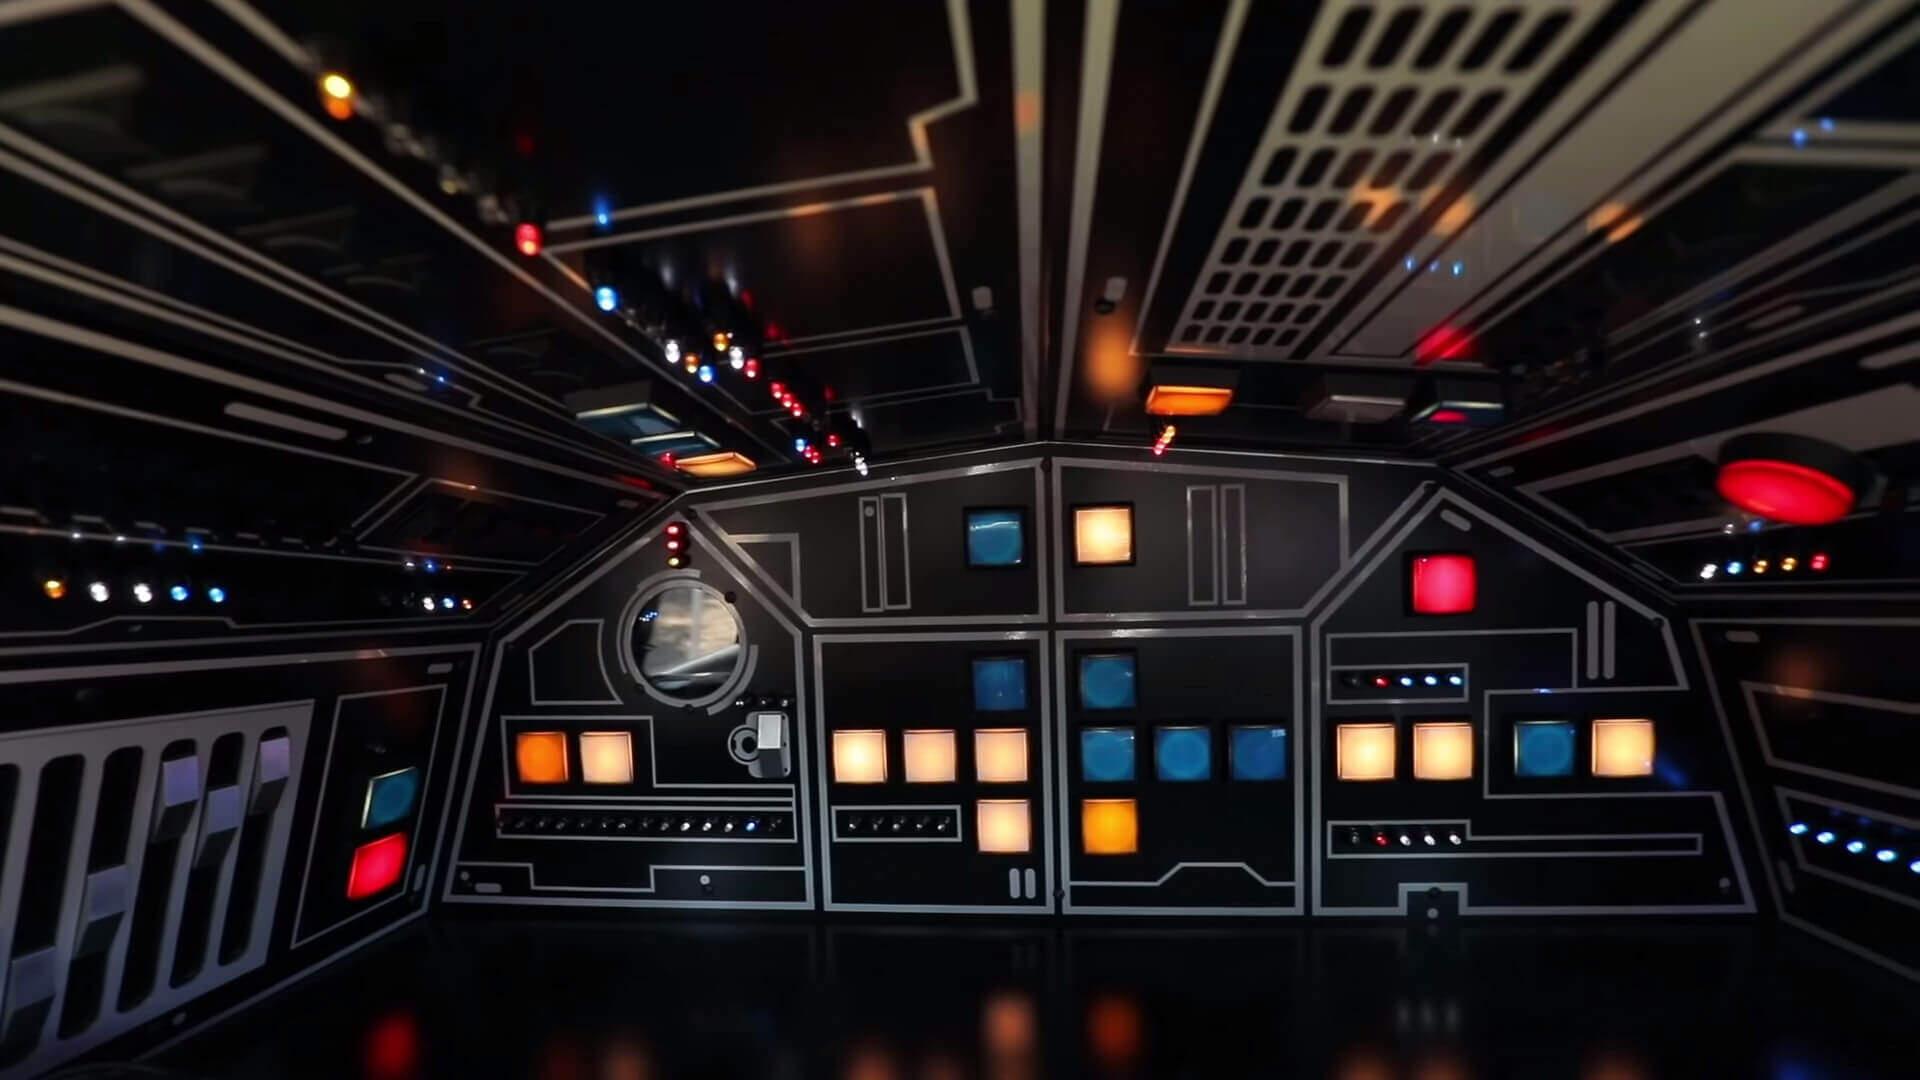 Nissan Rogue Star Wars Themed Show Vehicle screenshot 3